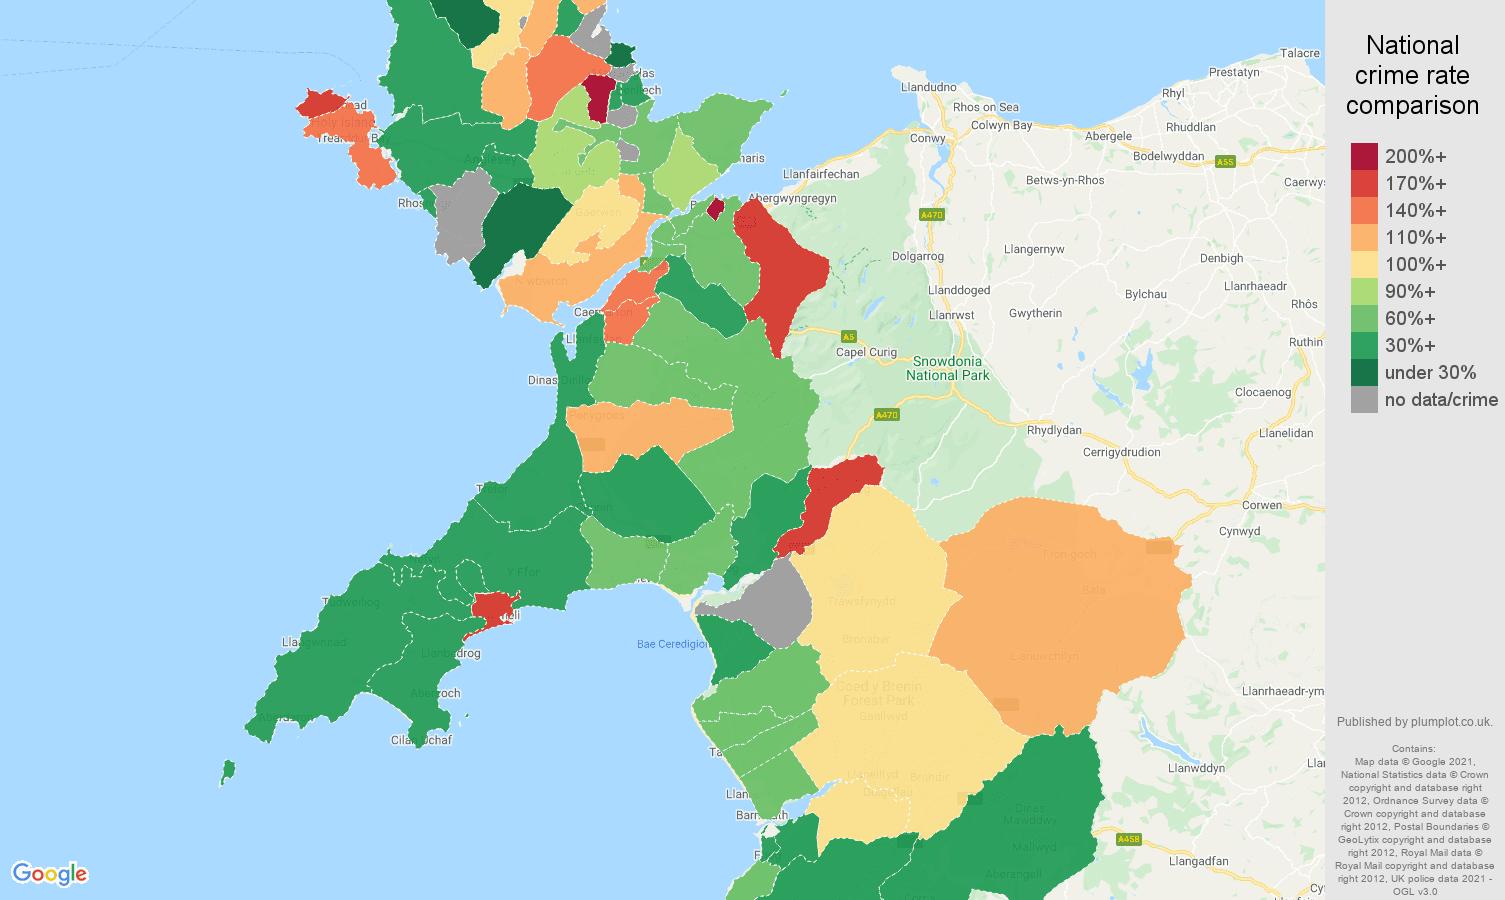 Gwynedd criminal damage and arson crime rate comparison map